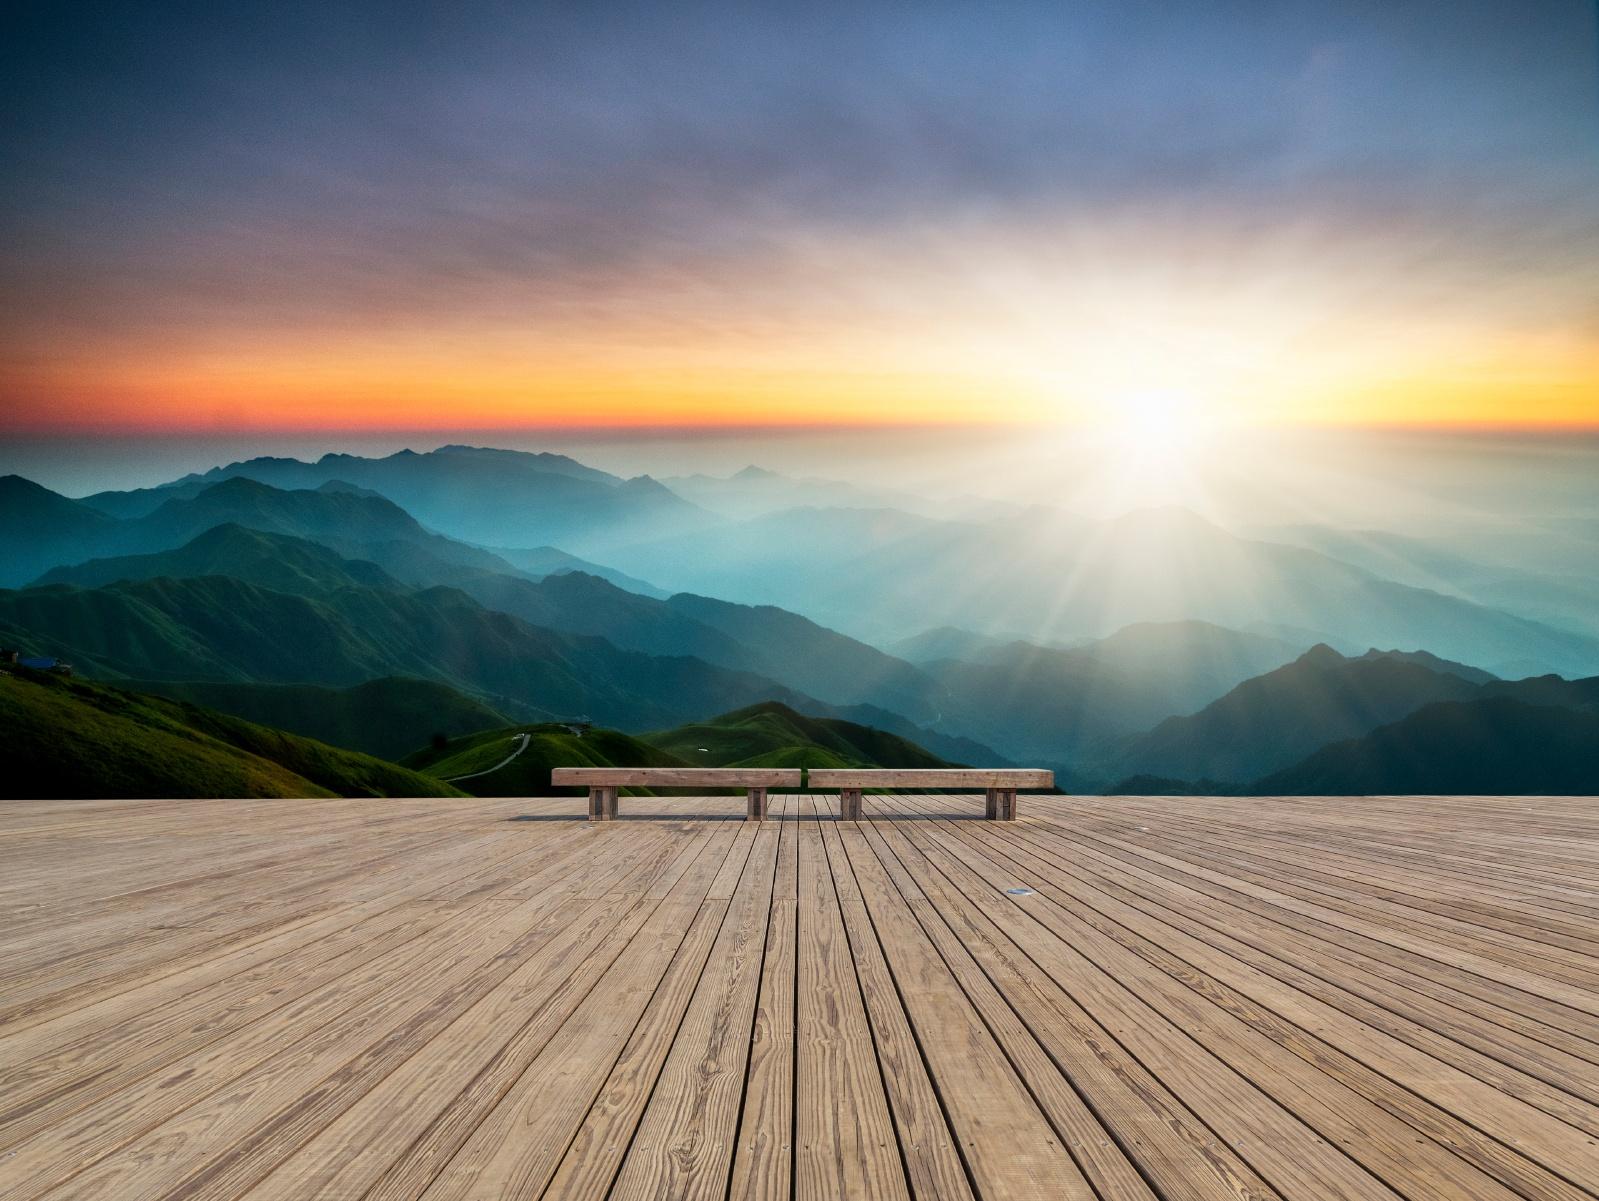 istock_photo_bench_mountains.jpeg